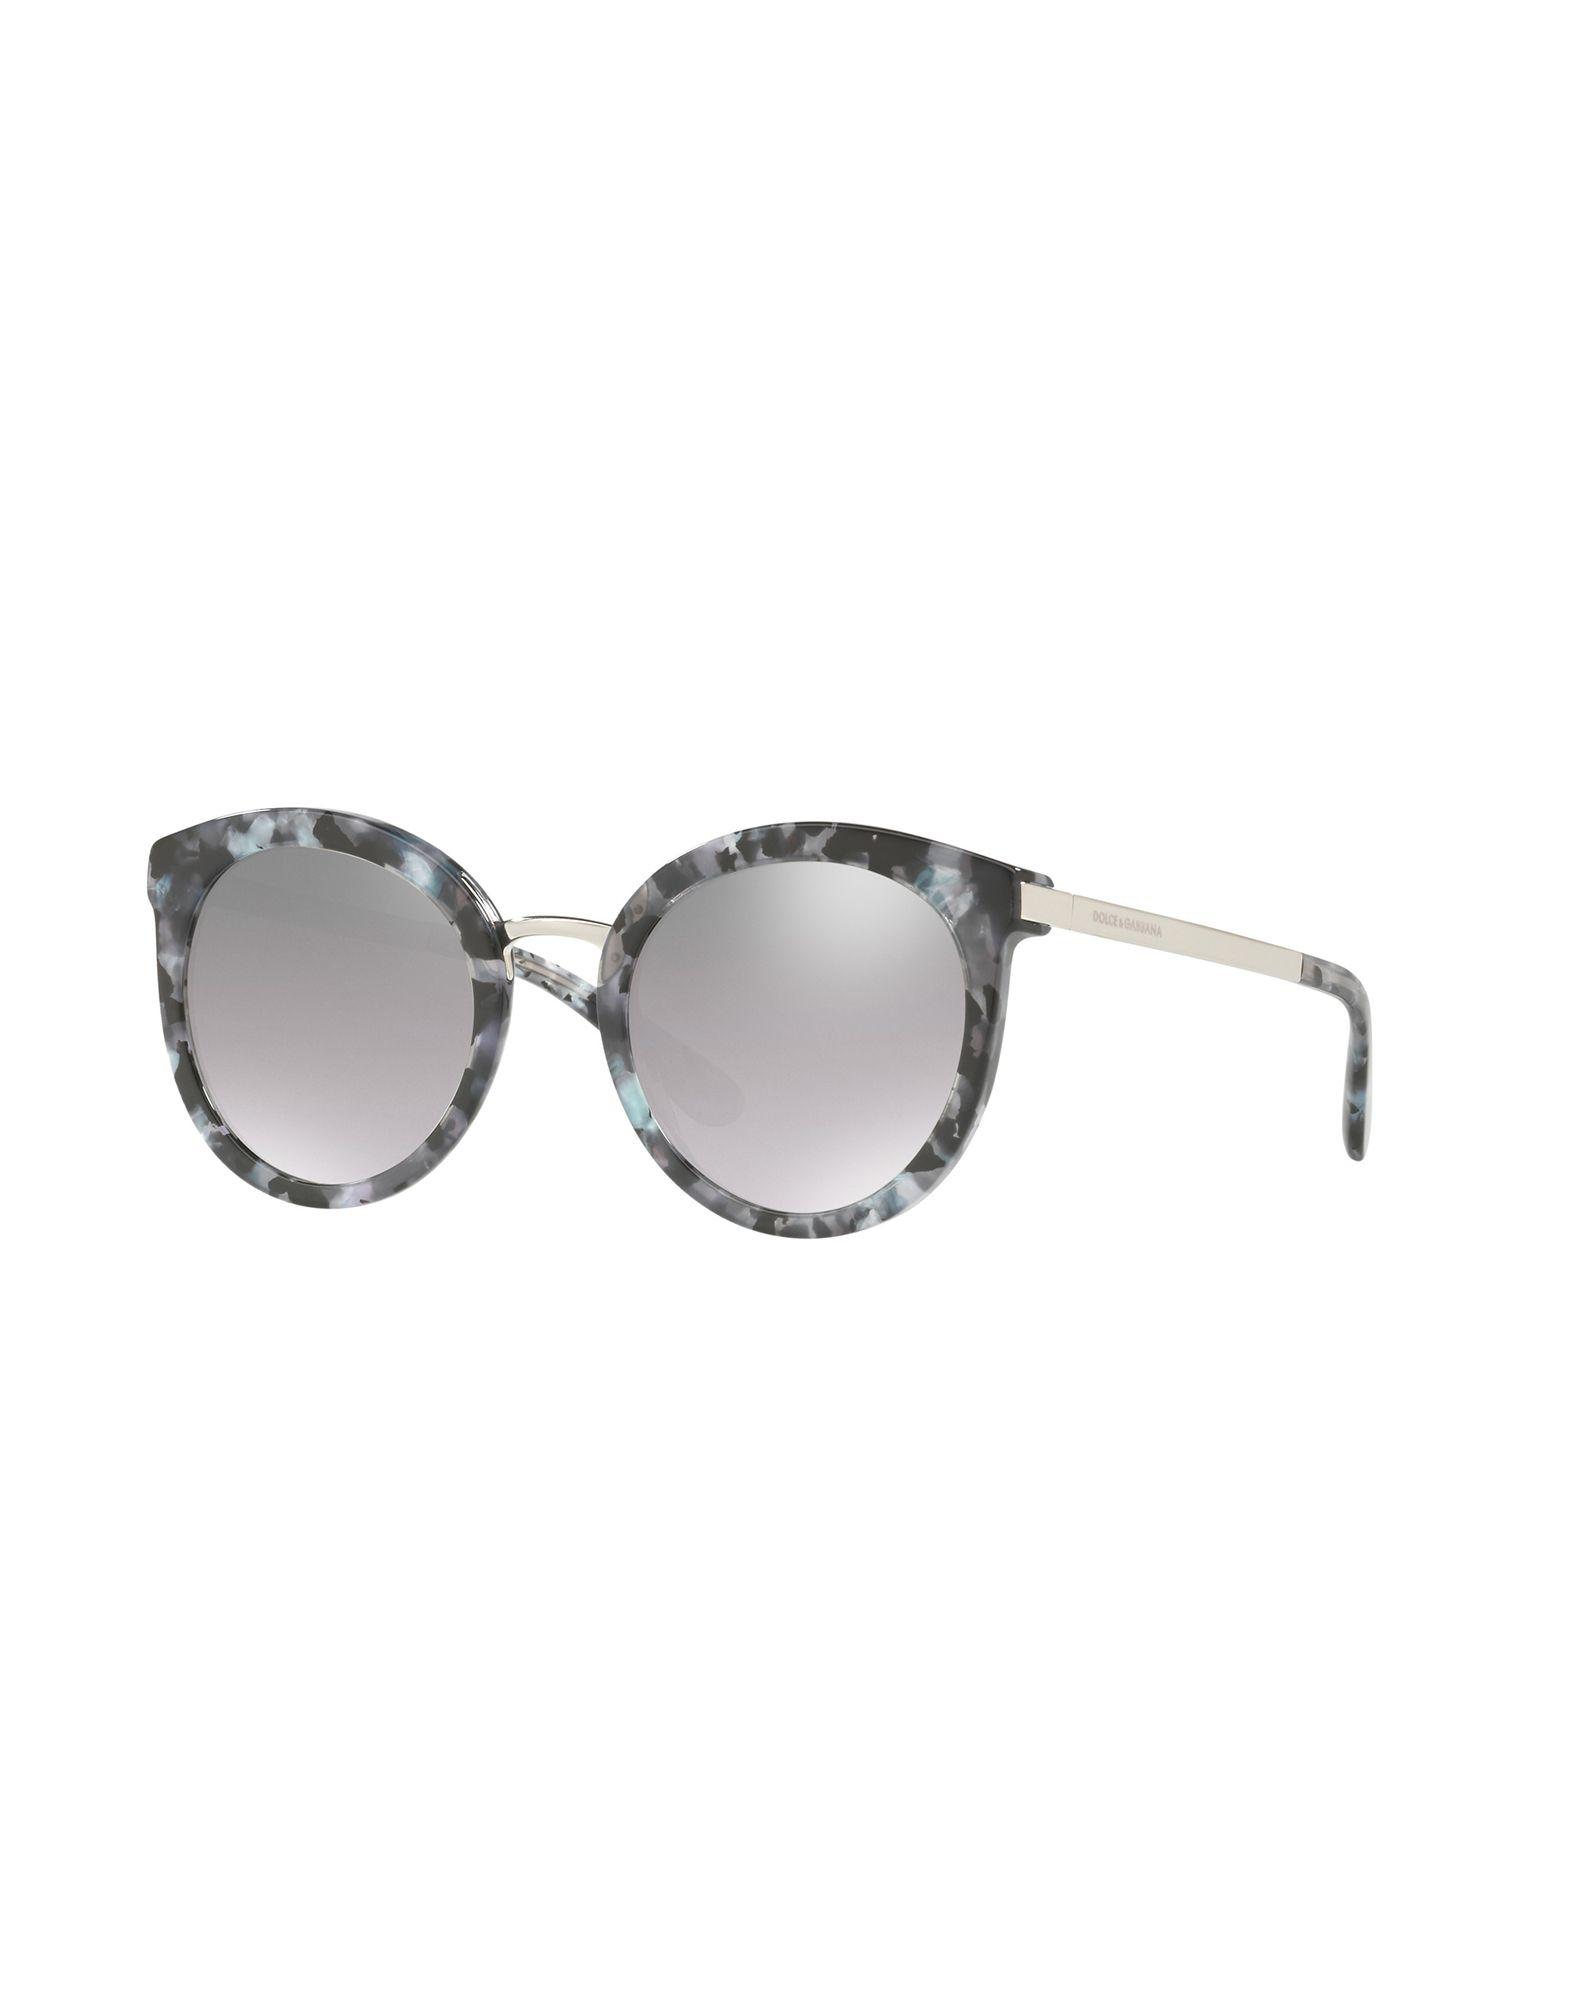 Occhiali Da Sole Dolce & Gabbana Dg4268 - Donna - Acquista online su